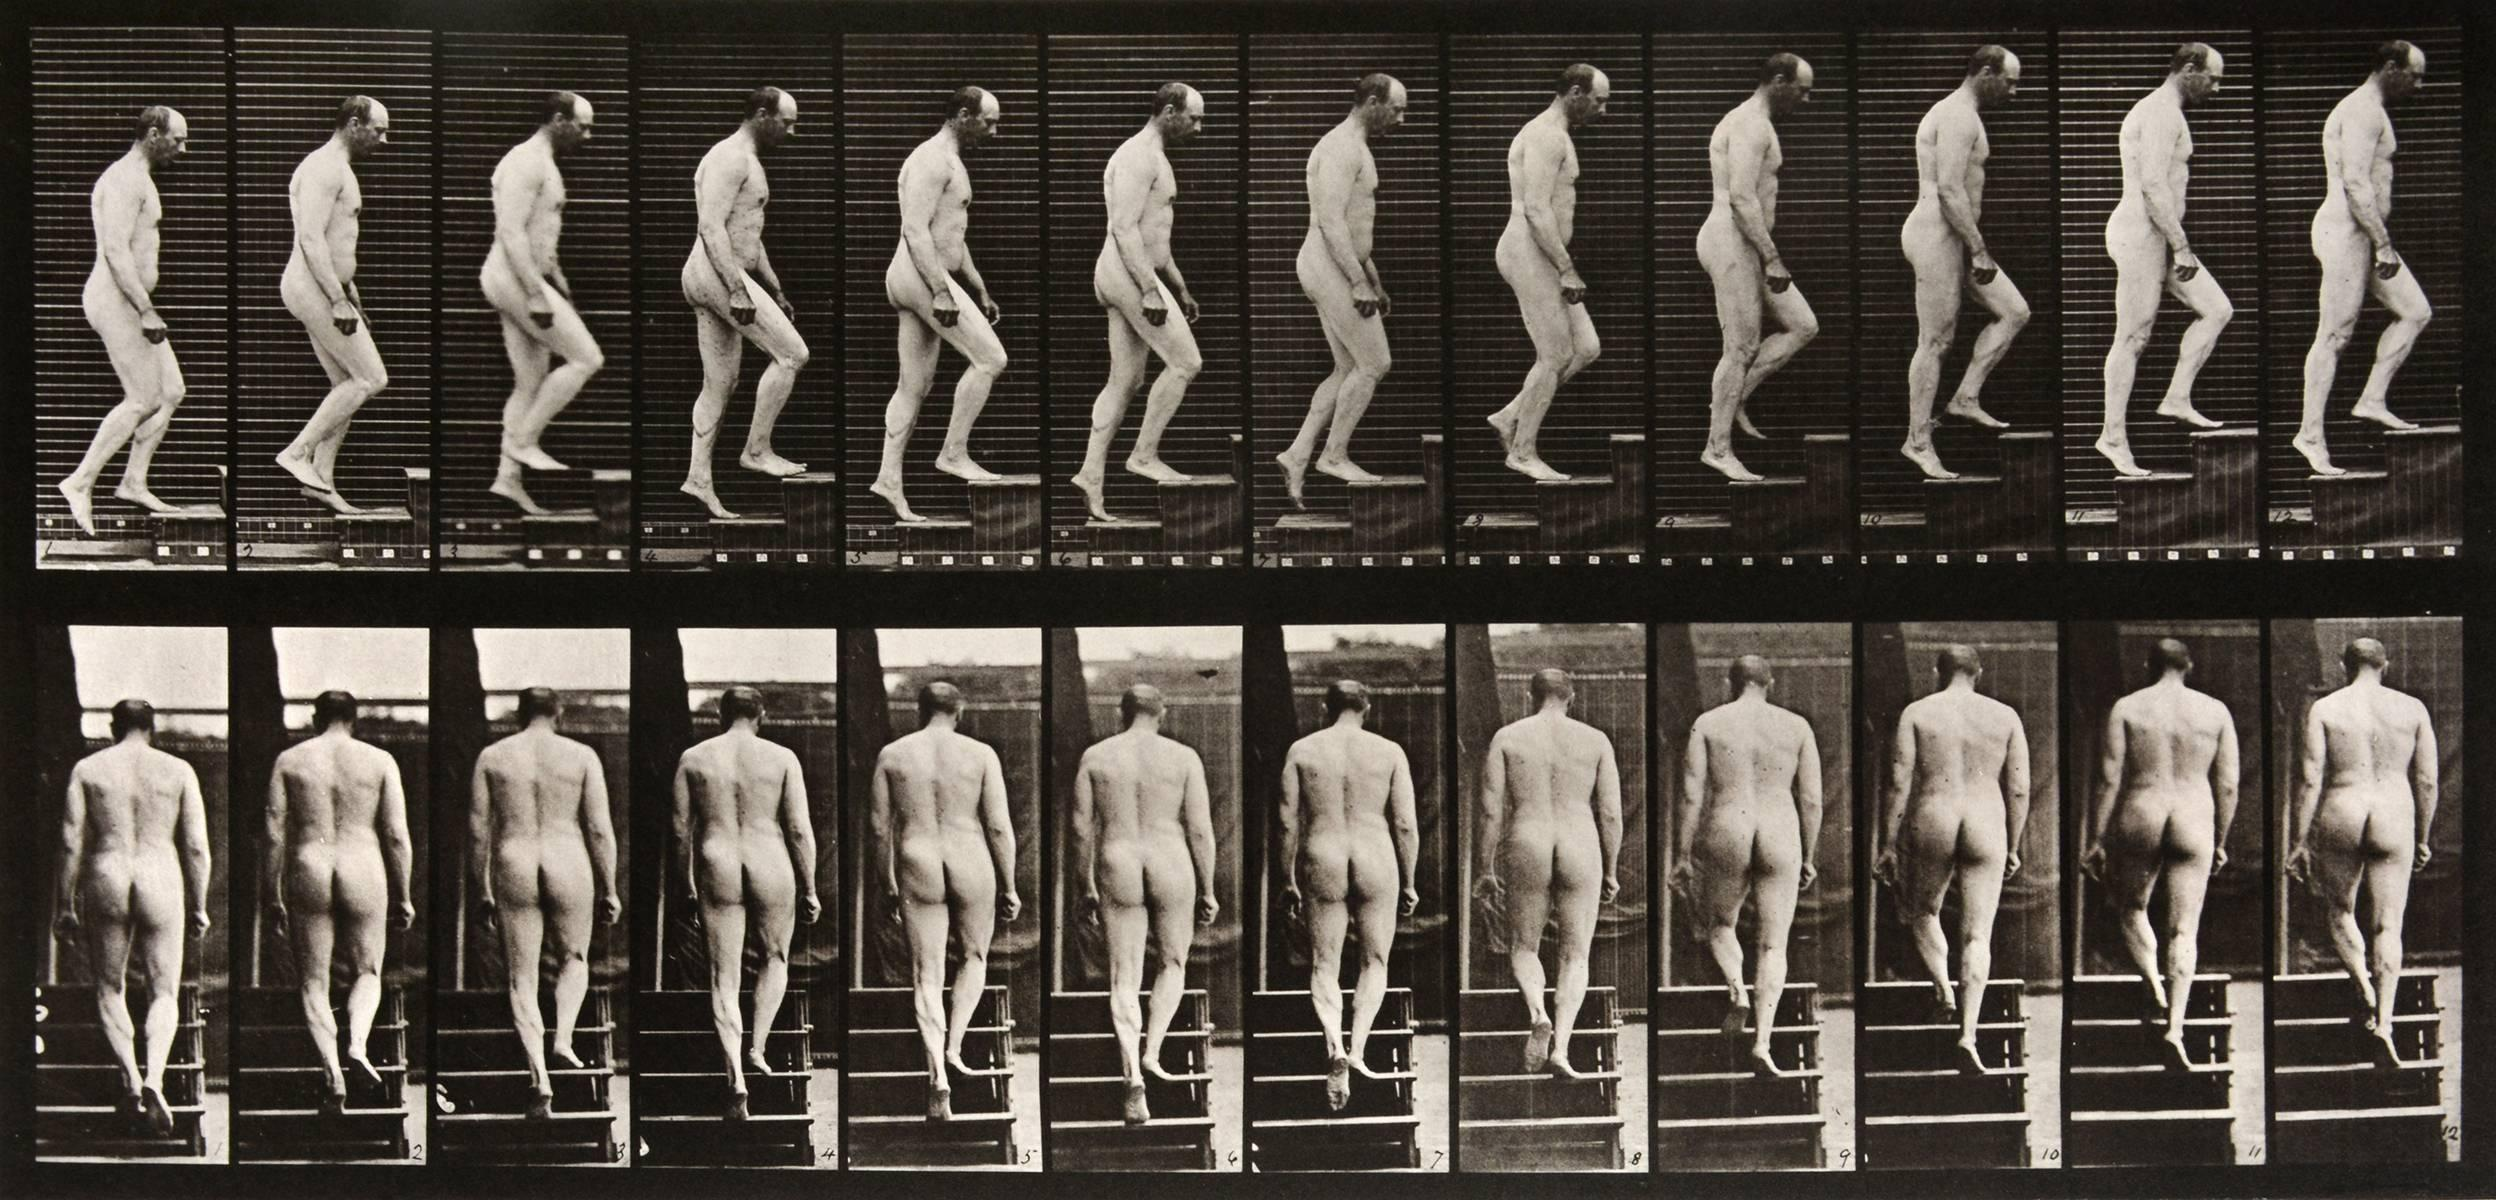 Animal Locomotion: Plate 89 (Nude Man Ascending Staircase), 1887 - Muybridge